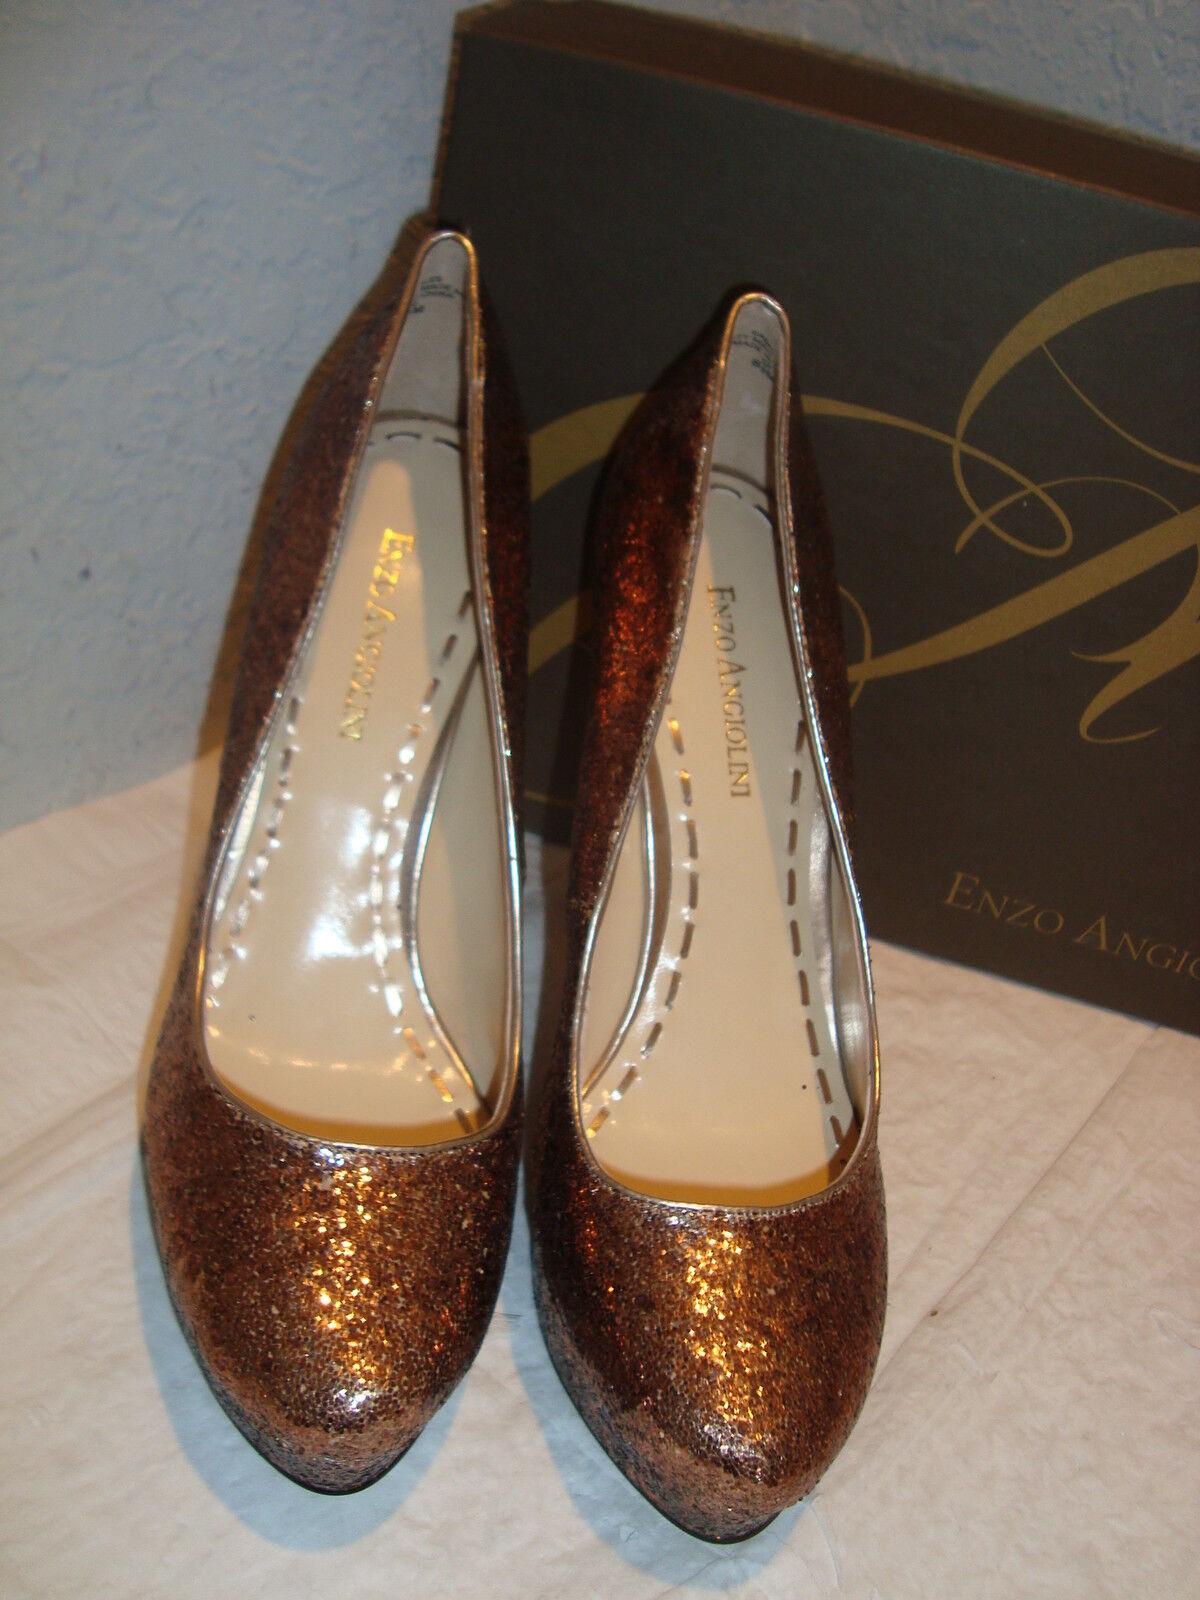 New Enzo Angiolini Damenschuhe Smiles Gold Heels Heels Heels Schuhes 8.5 Medium 601d1c